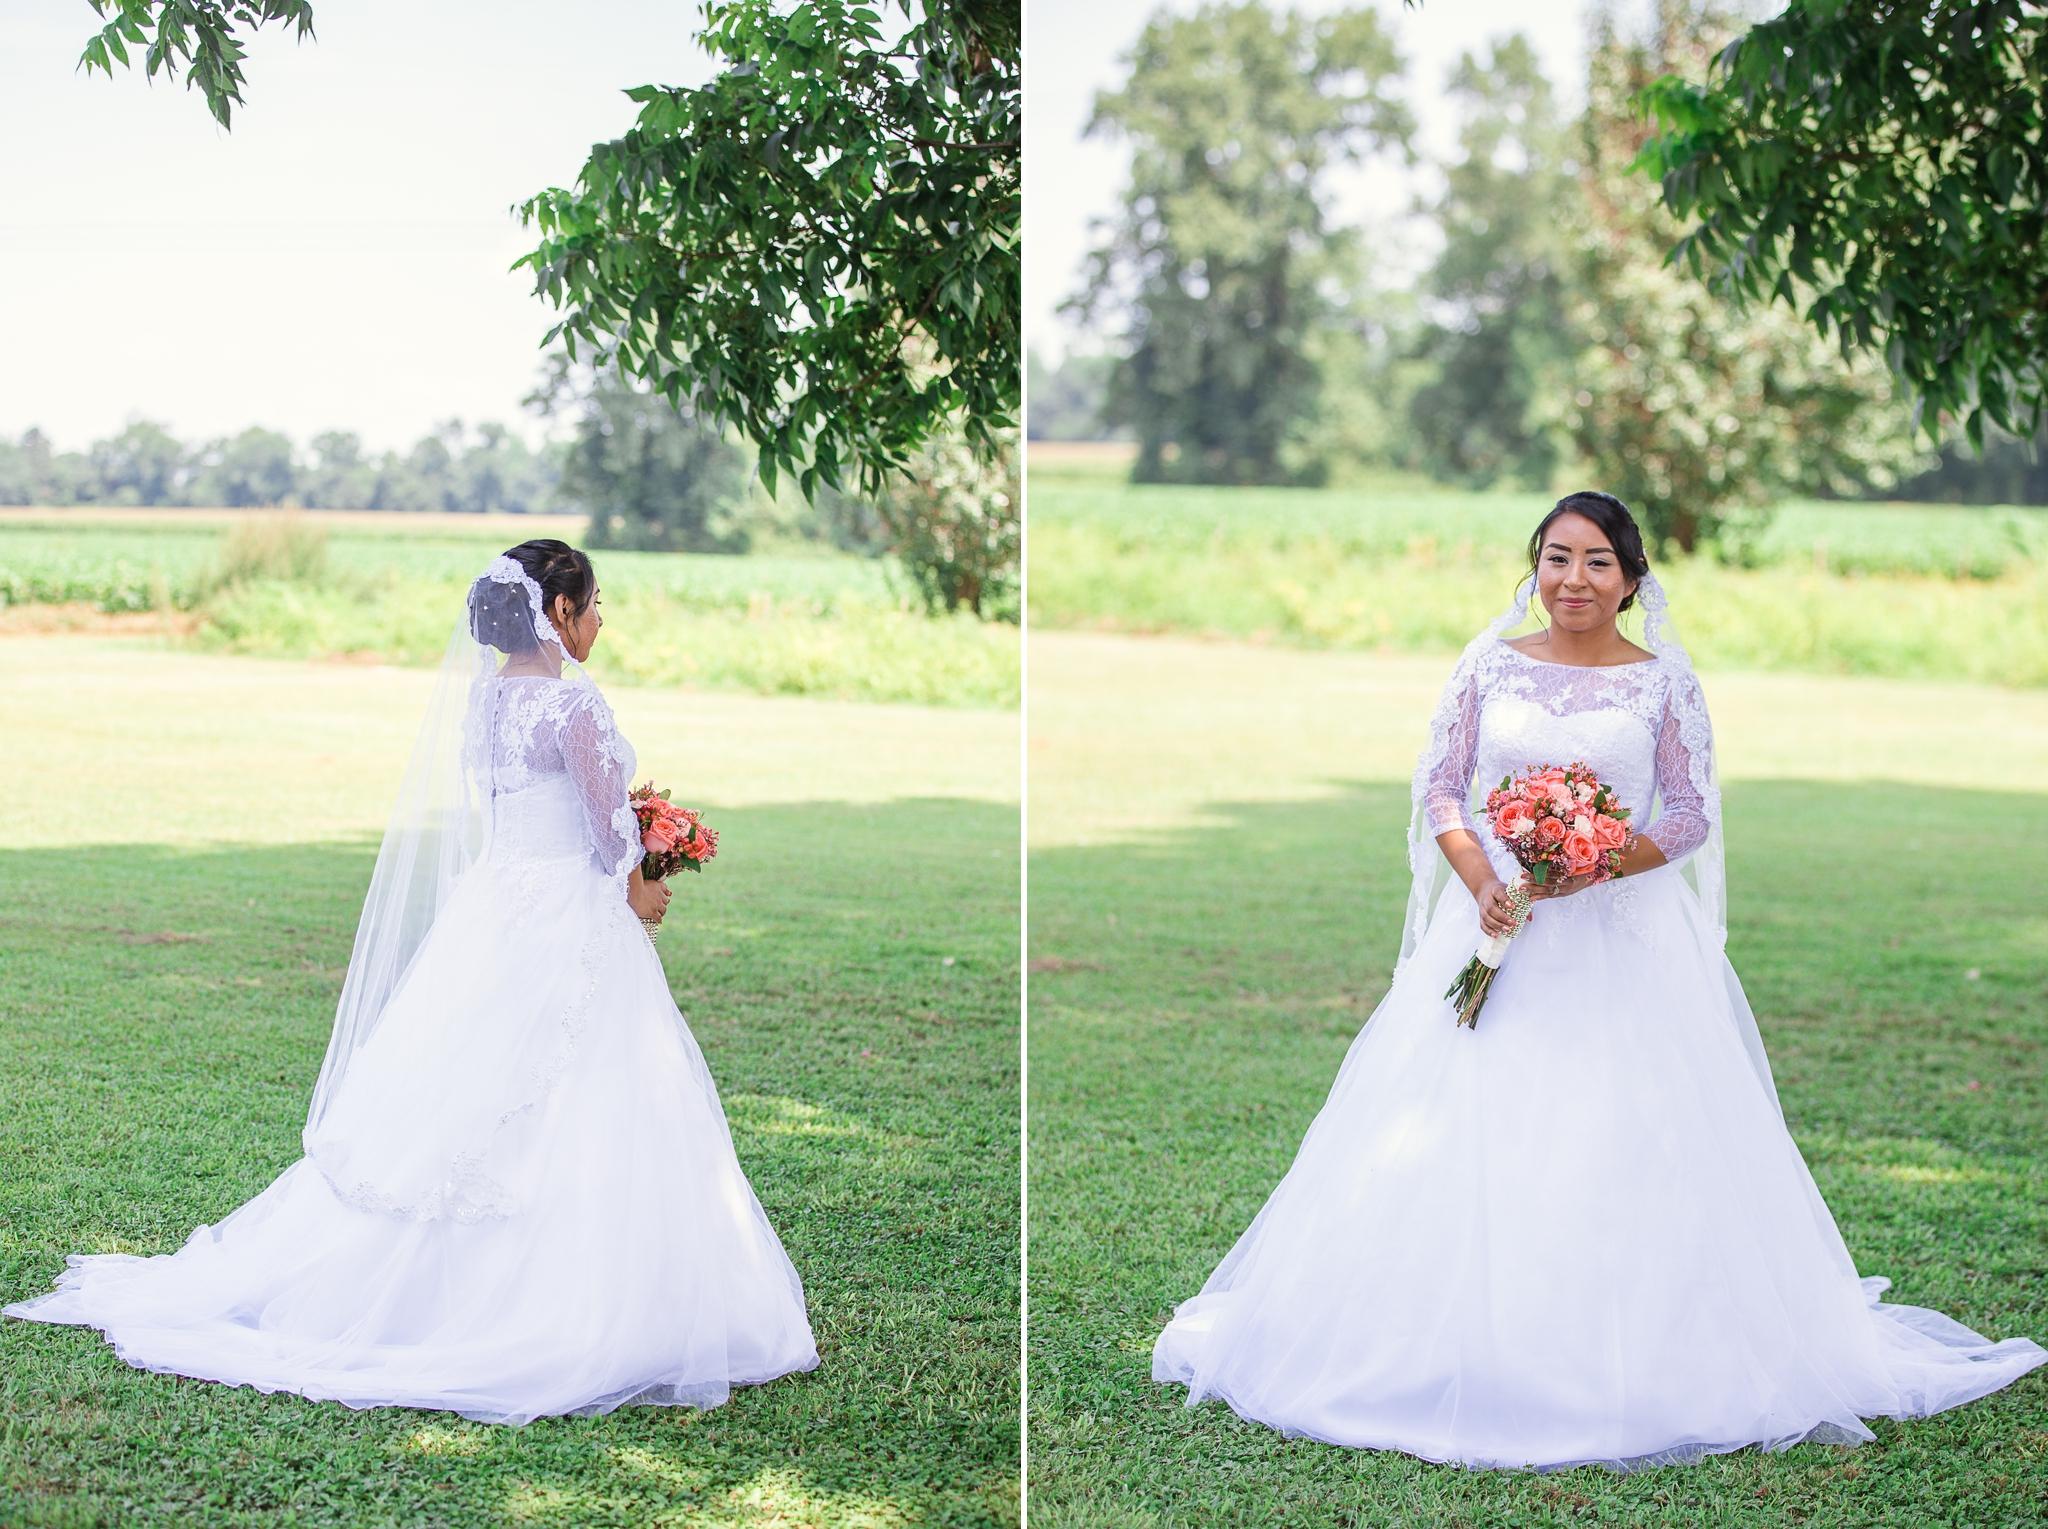 Bride in Davids Bridal Lace Wedding Dress with Roses St Pauls North Carolina Wedding Photography